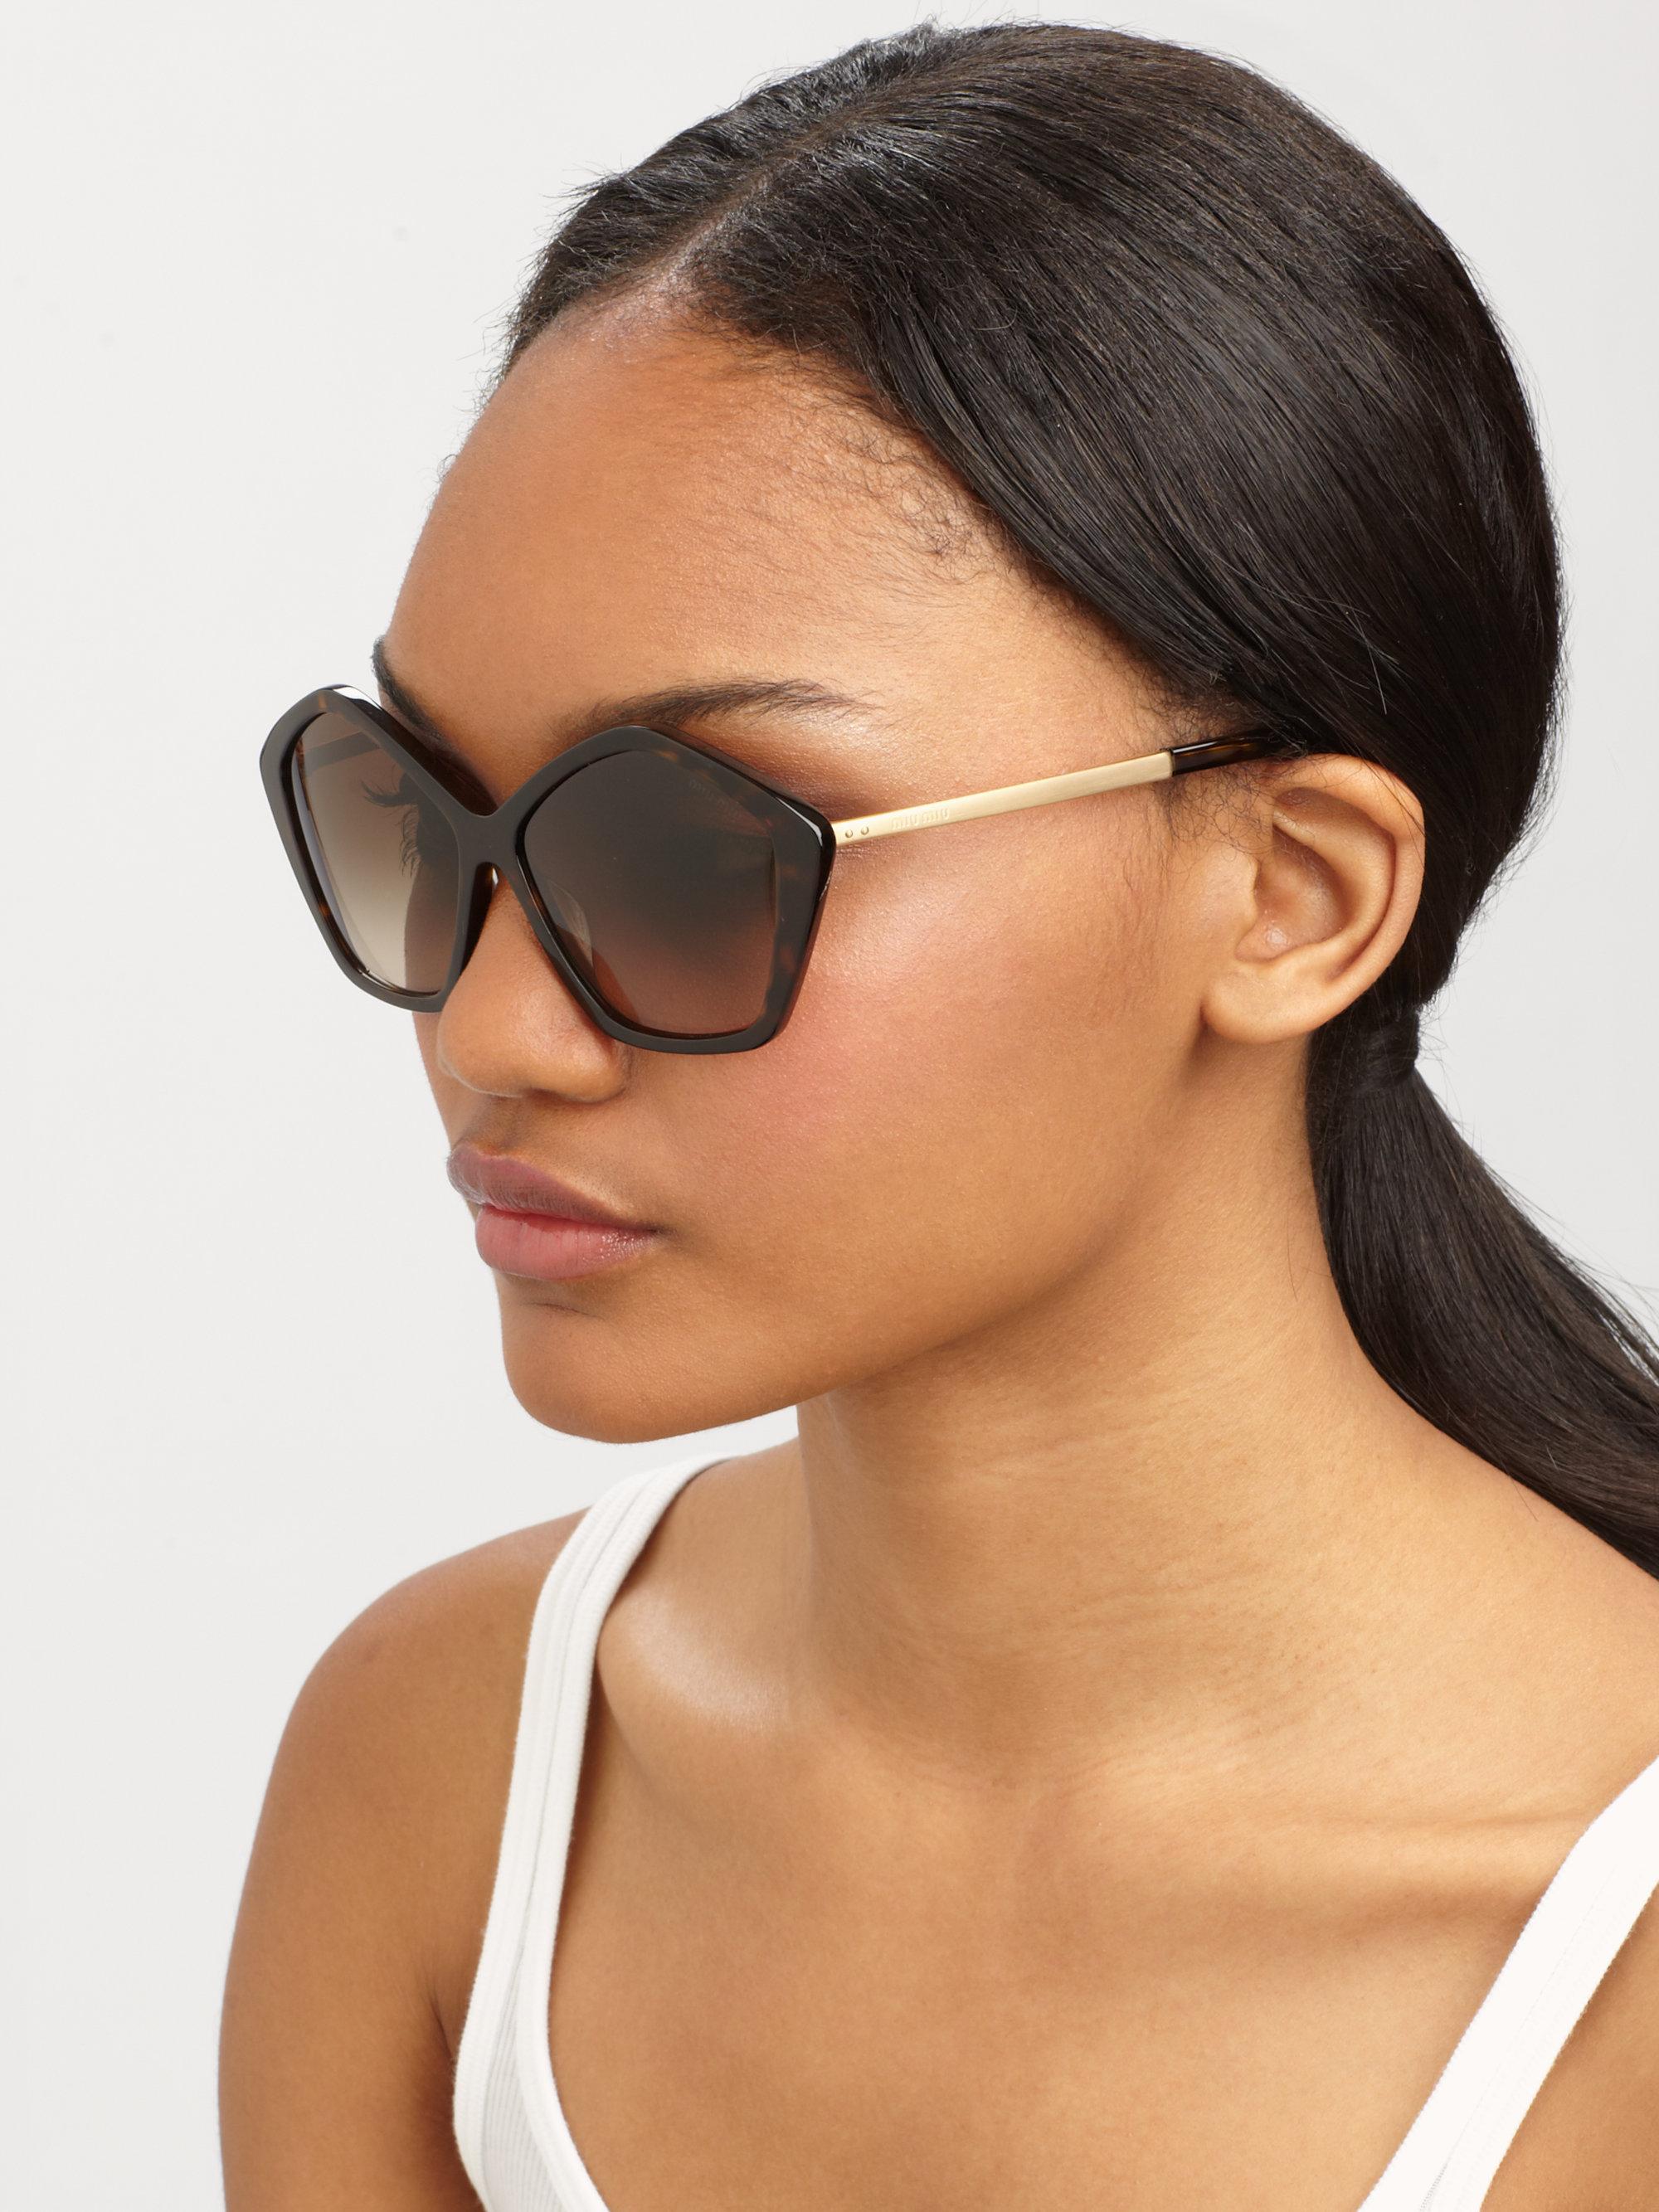 Miu Miu Hexagonal Sunglasses  miu miu star metal acetate sunglasses in brown lyst